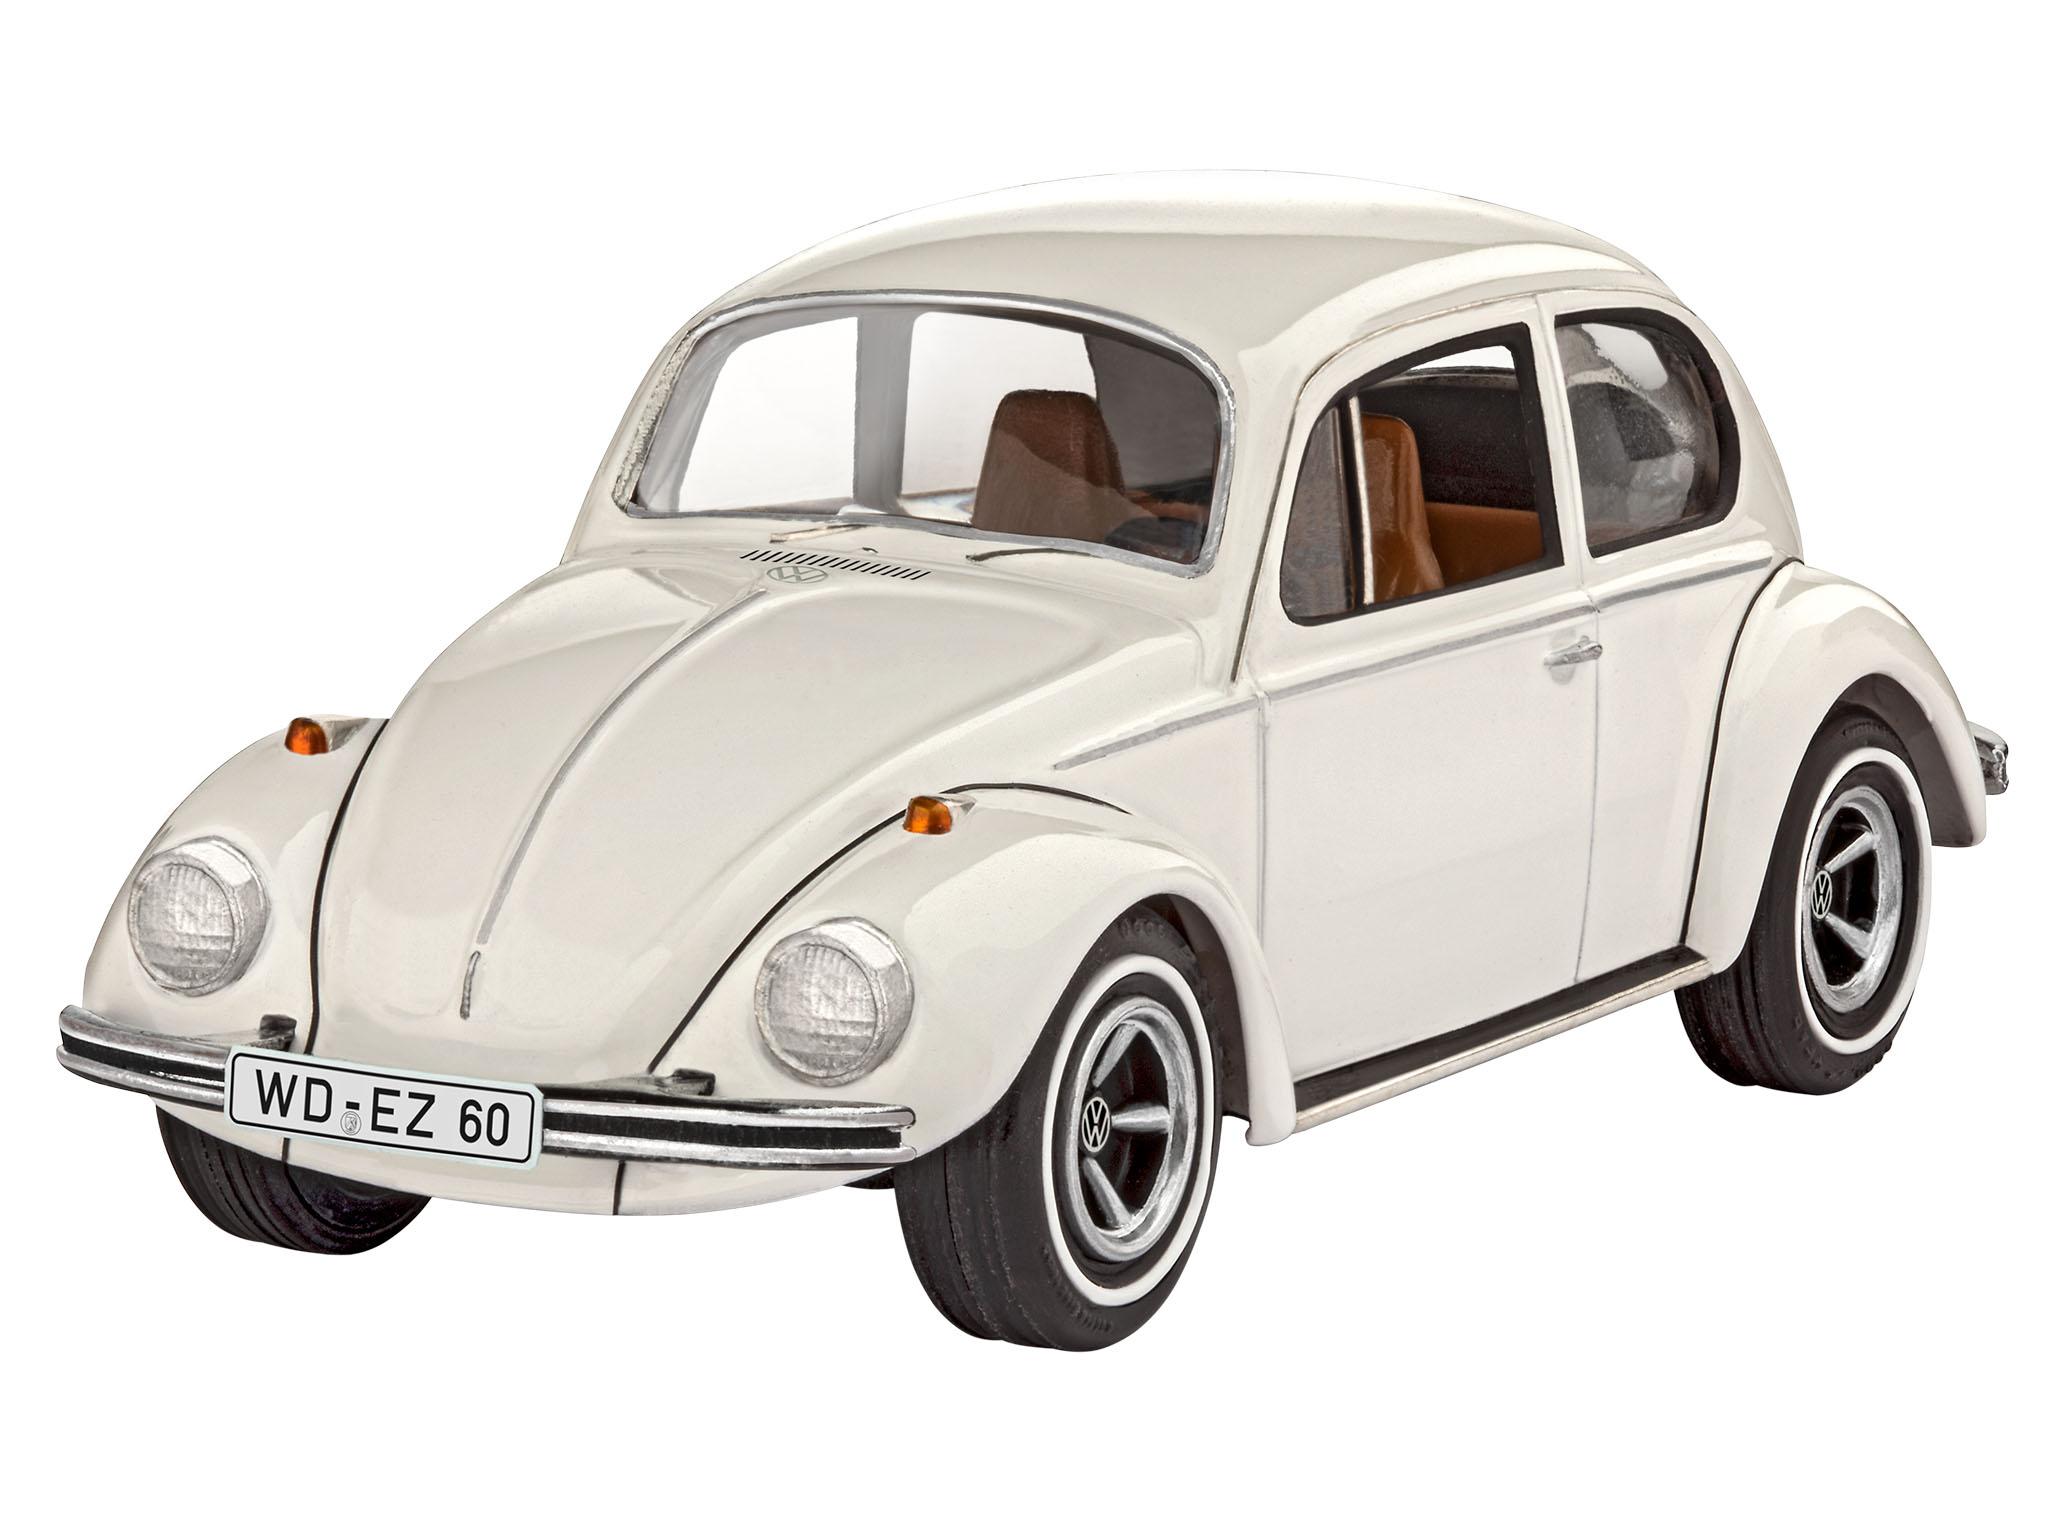 revell 07681 volkswagen k fer vw k fer auto bausatz modell ma stab 1 32 level 3 ebay. Black Bedroom Furniture Sets. Home Design Ideas